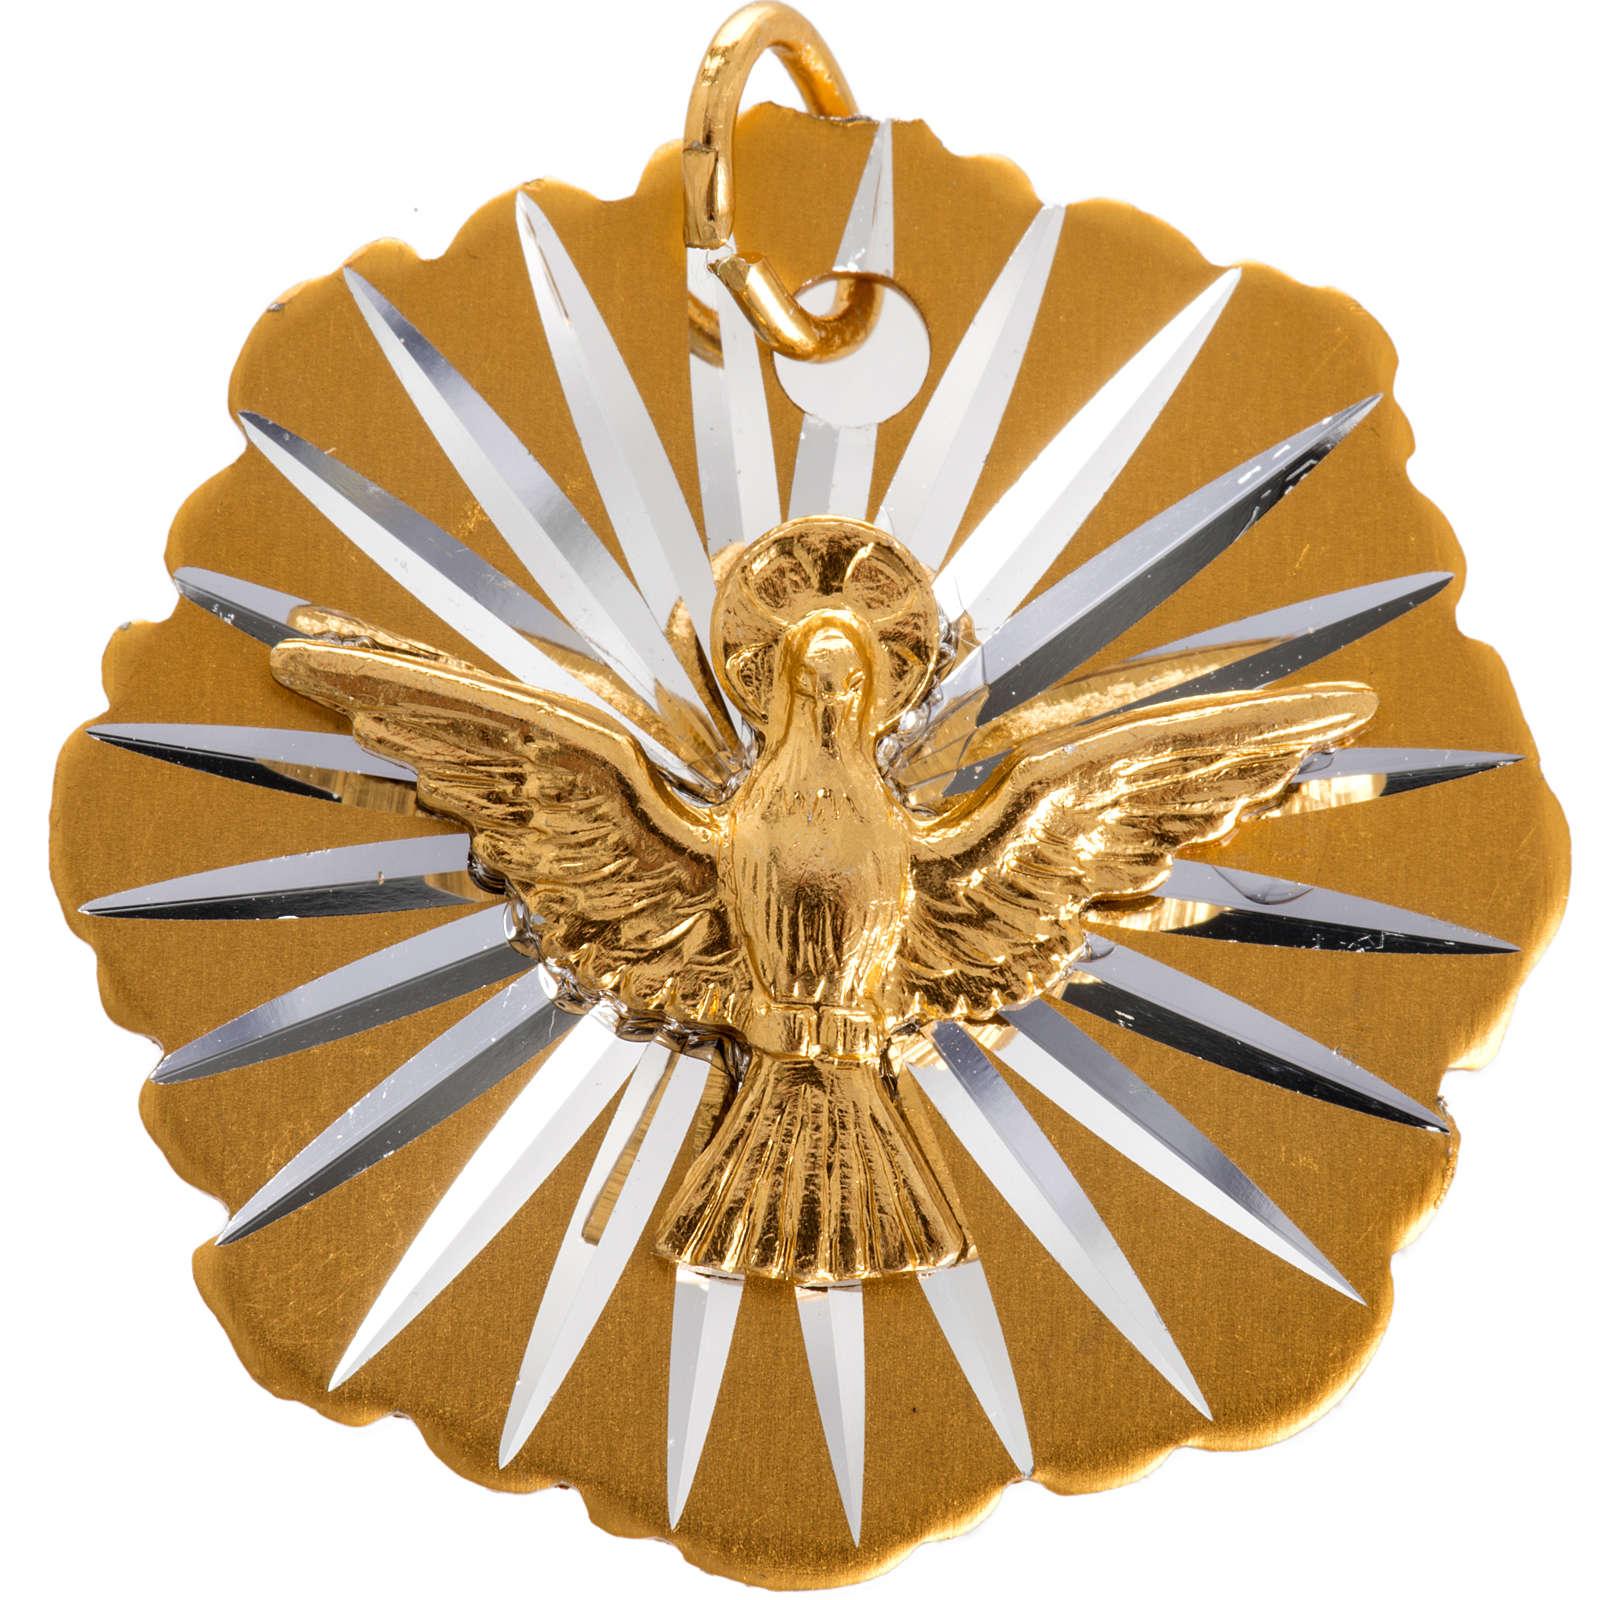 Médaille confirmation aluminium dorée 25mm 4